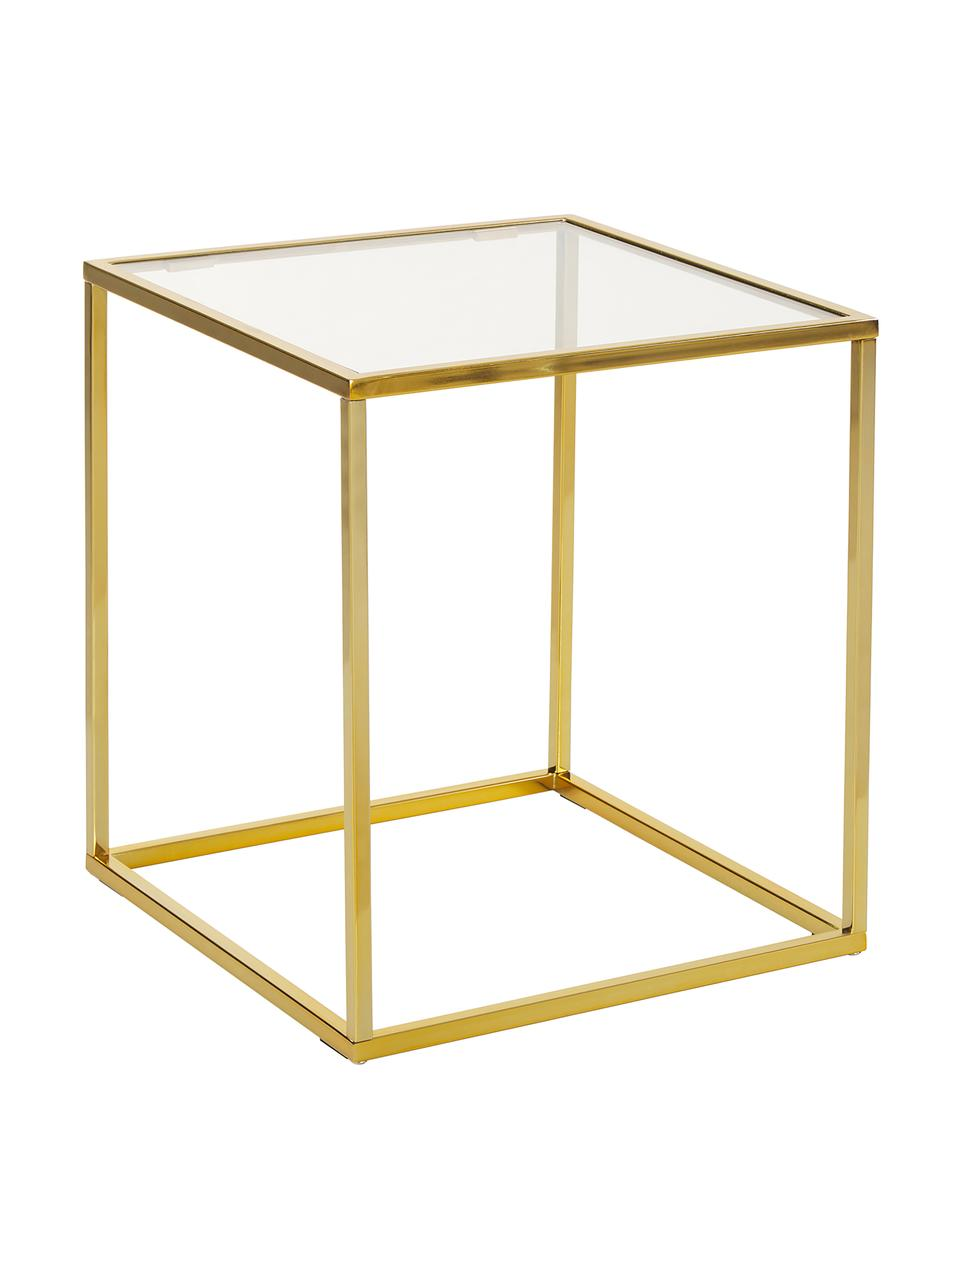 Bijzettafel Maya met glazen tafelblad, Tafelblad: veiligheidsglas, Frame: gegalvaniseerd metaal, Tafelblad: glas, transparant. Frame: glanzend goudkleurig, B 45 cm